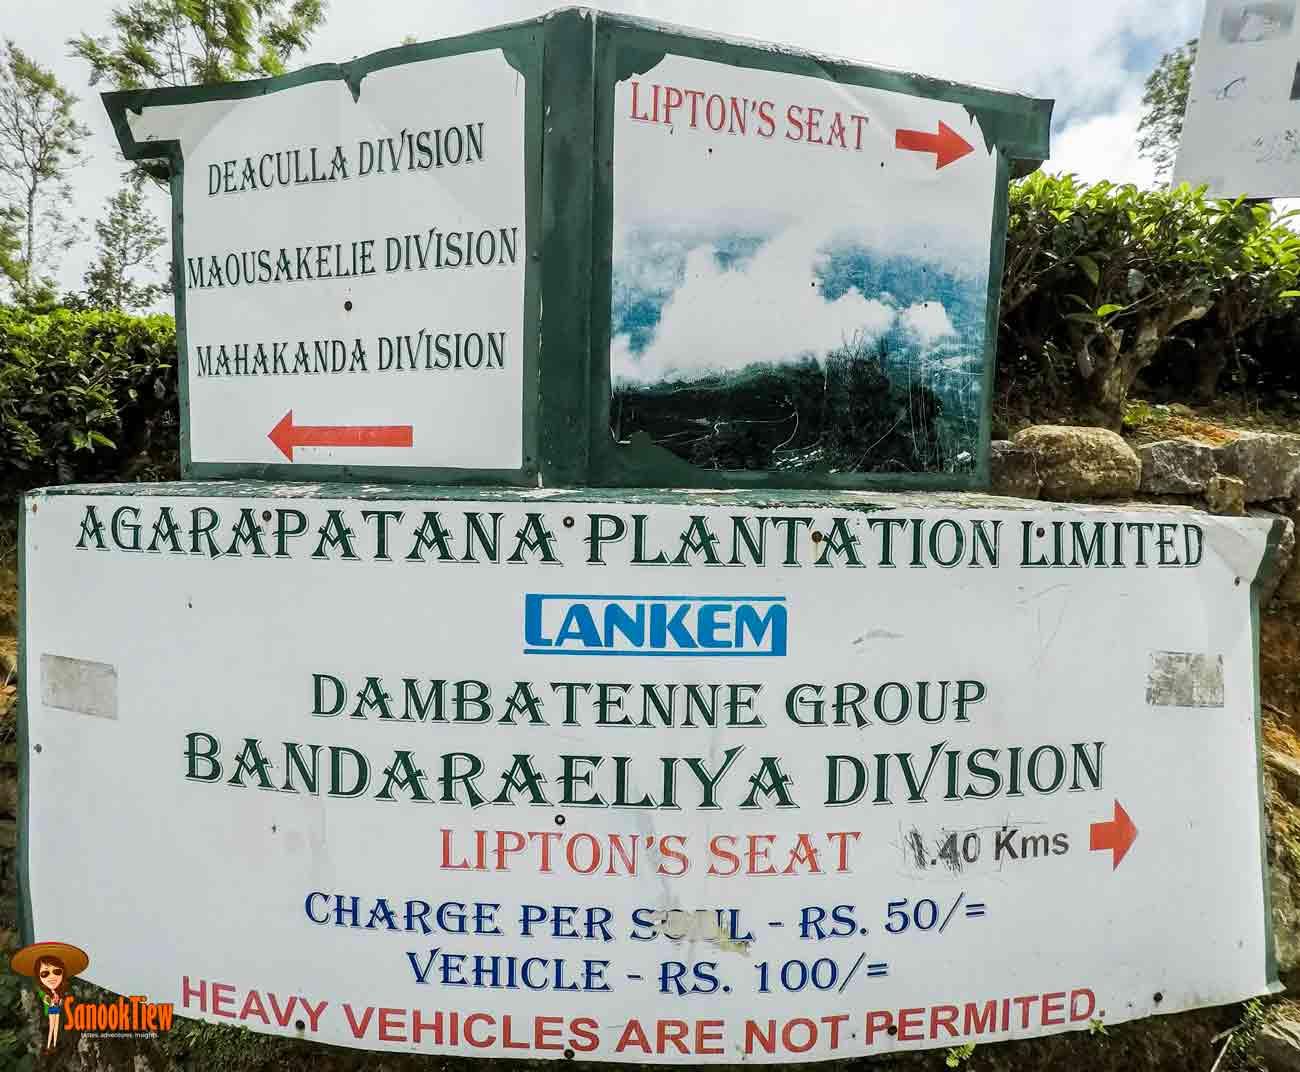 Lipton's seat ไร่ชาลิปตัน Haputale Srilanka ศรีลังกา